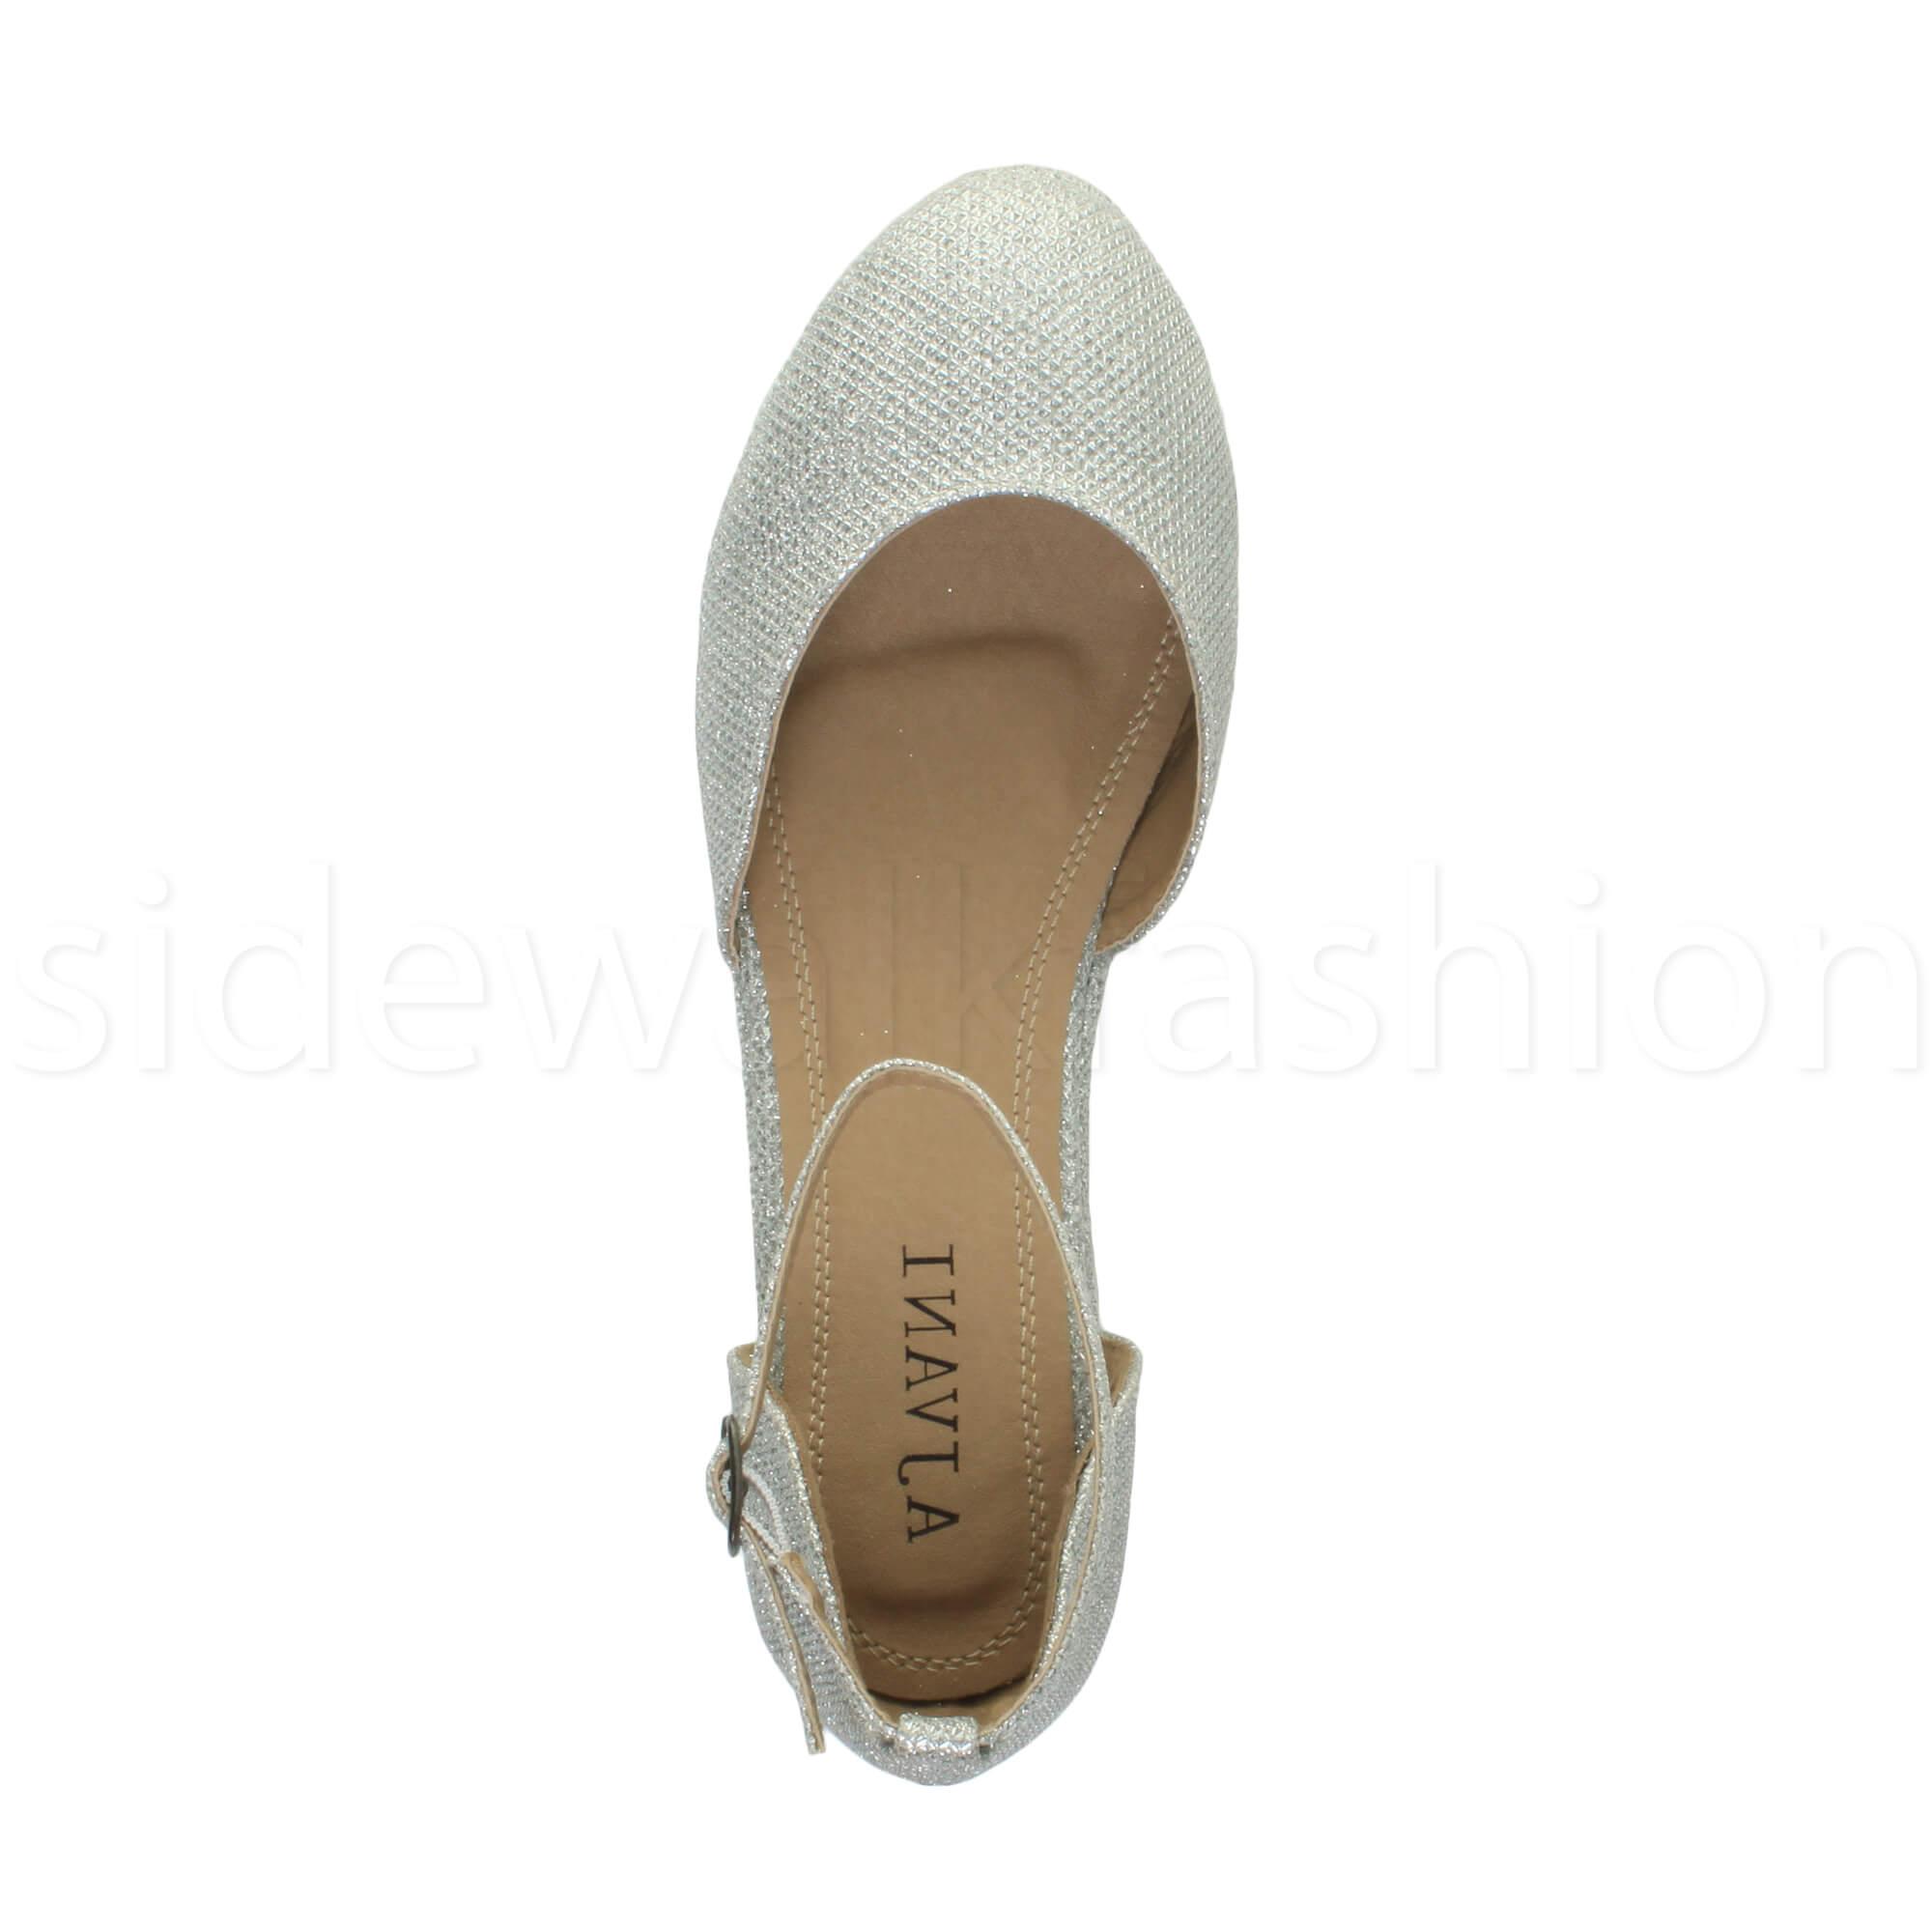 Womens-ladies-flatform-mid-wedge-ankle-strap-platform-court-shoes-sandals-size thumbnail 72